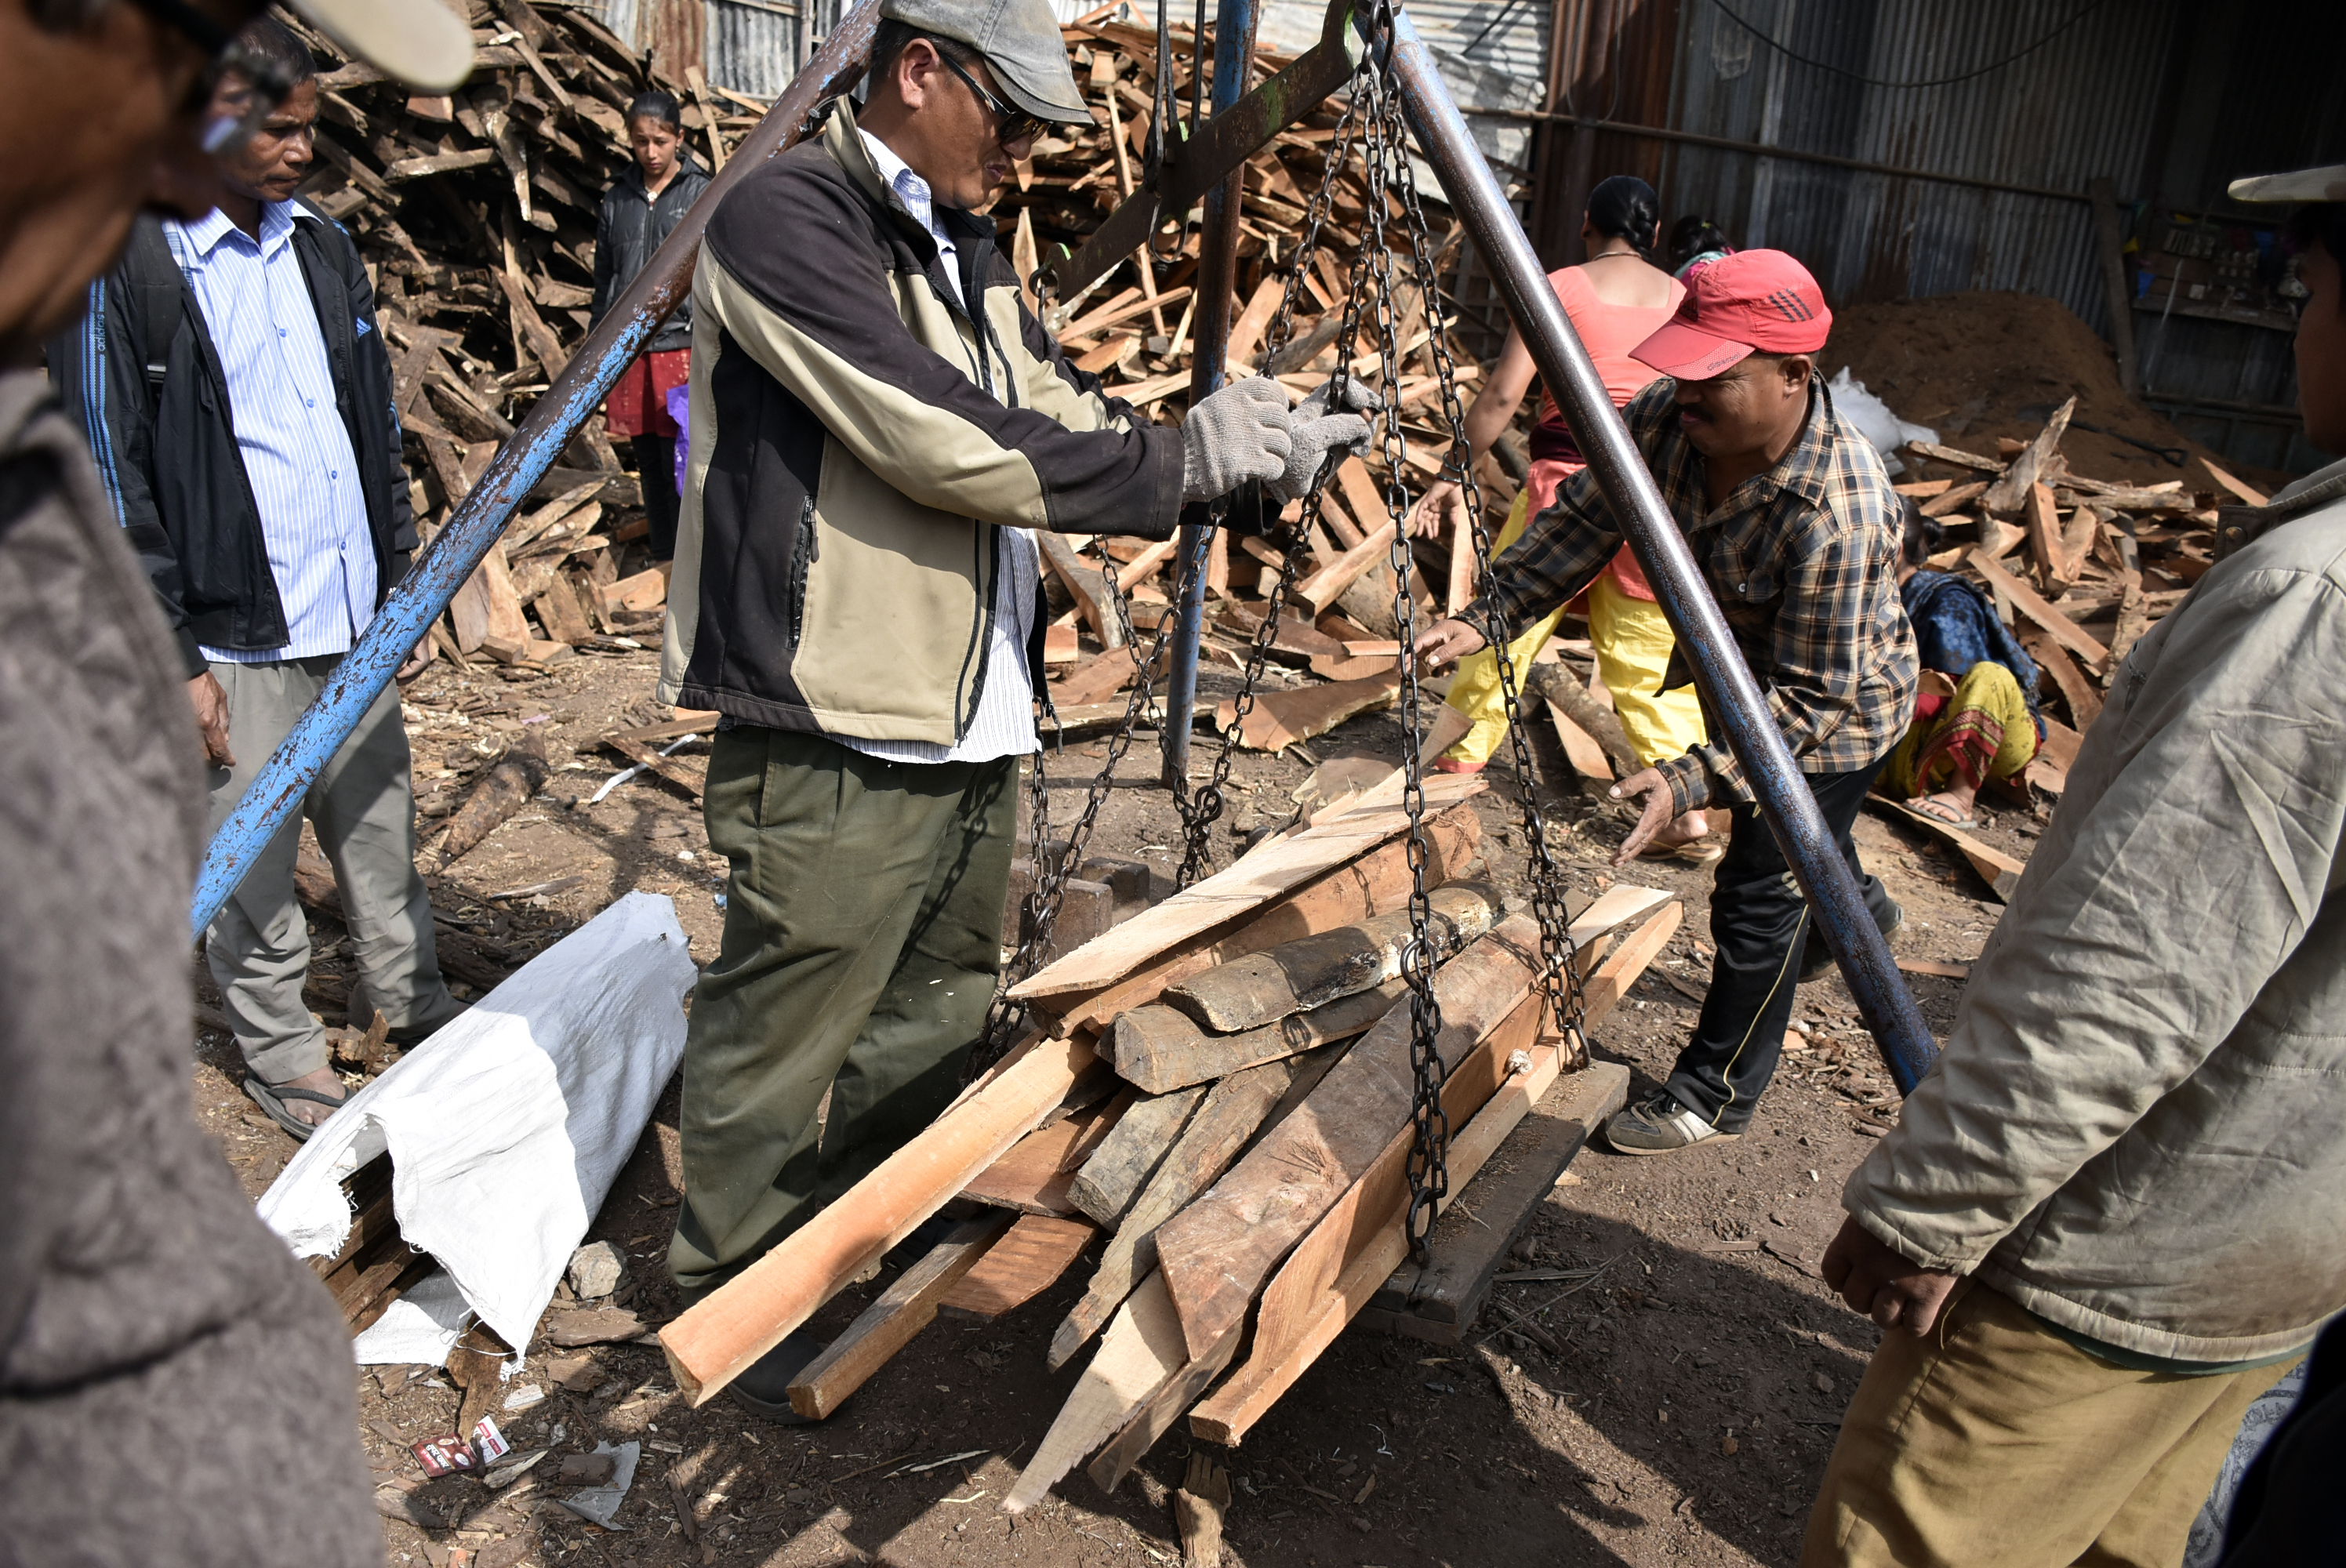 depot staffers weighing firewood, in Gwarko, Lalitpur, on Sunday.